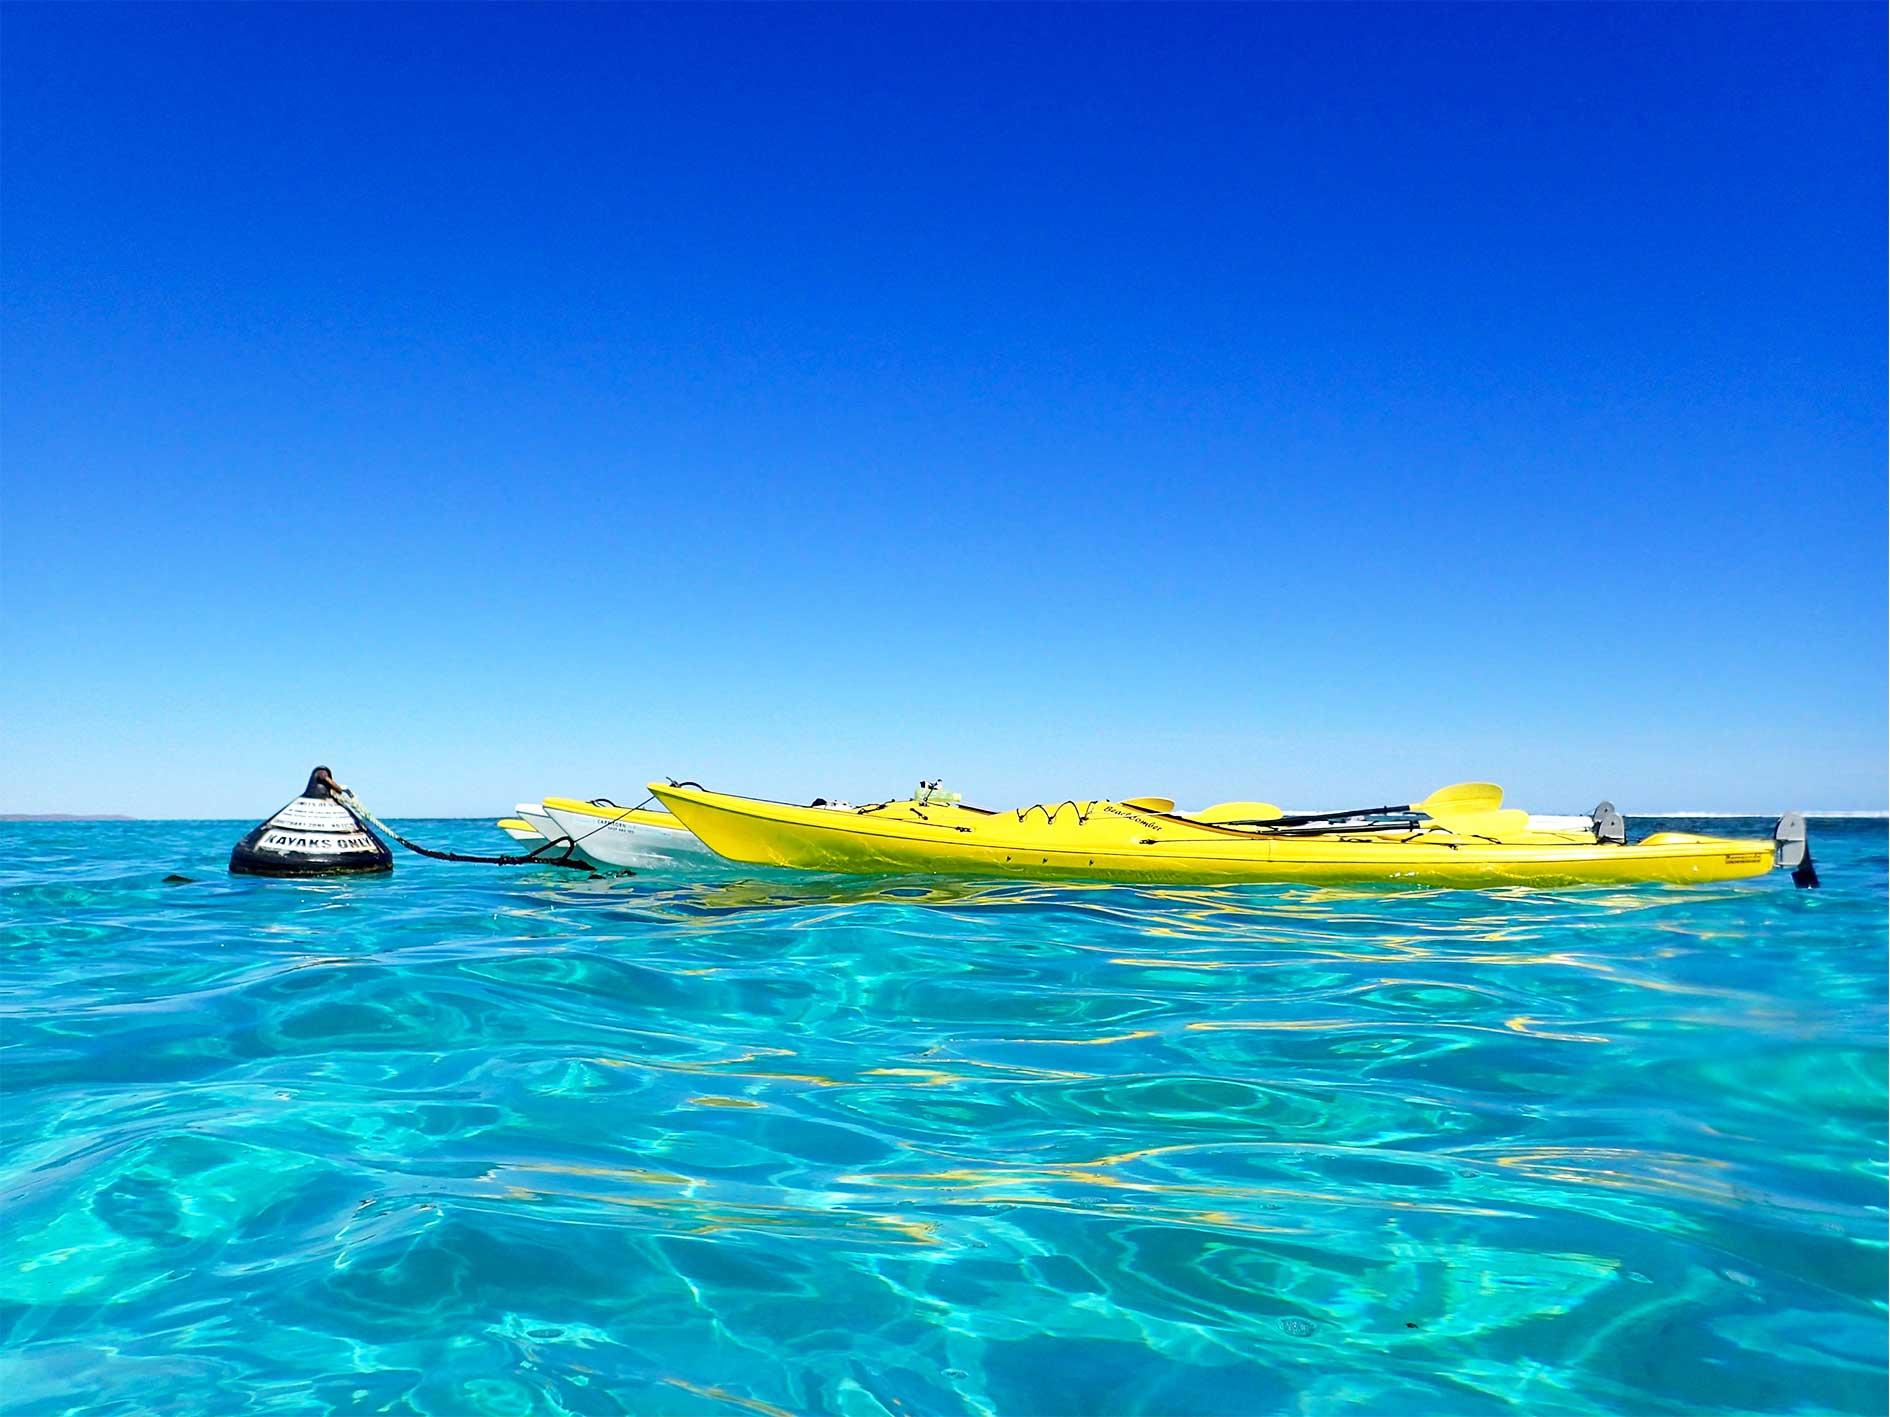 5 Day Ultimate Safari, Sea Kayak Ningaloo, multi day tour exmouth ningaloo, camping tour ningaloo, best tour exmouth, Whale Shark, sea kayak, snorkel, bush walk, base camp, eco tour, Ningaloo Reef, Exmouth, Western Australia